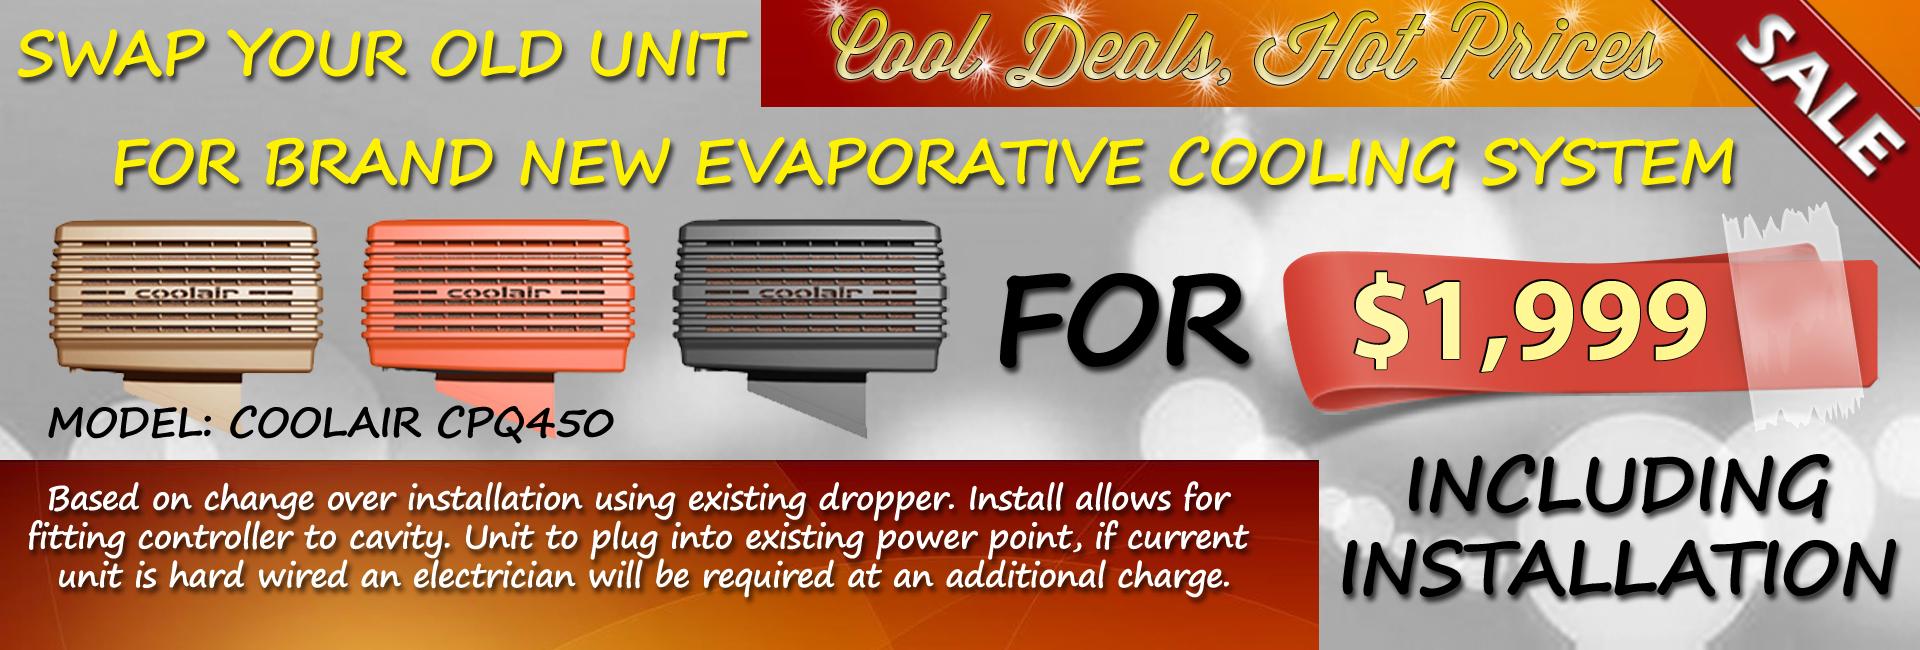 Evap Cooling